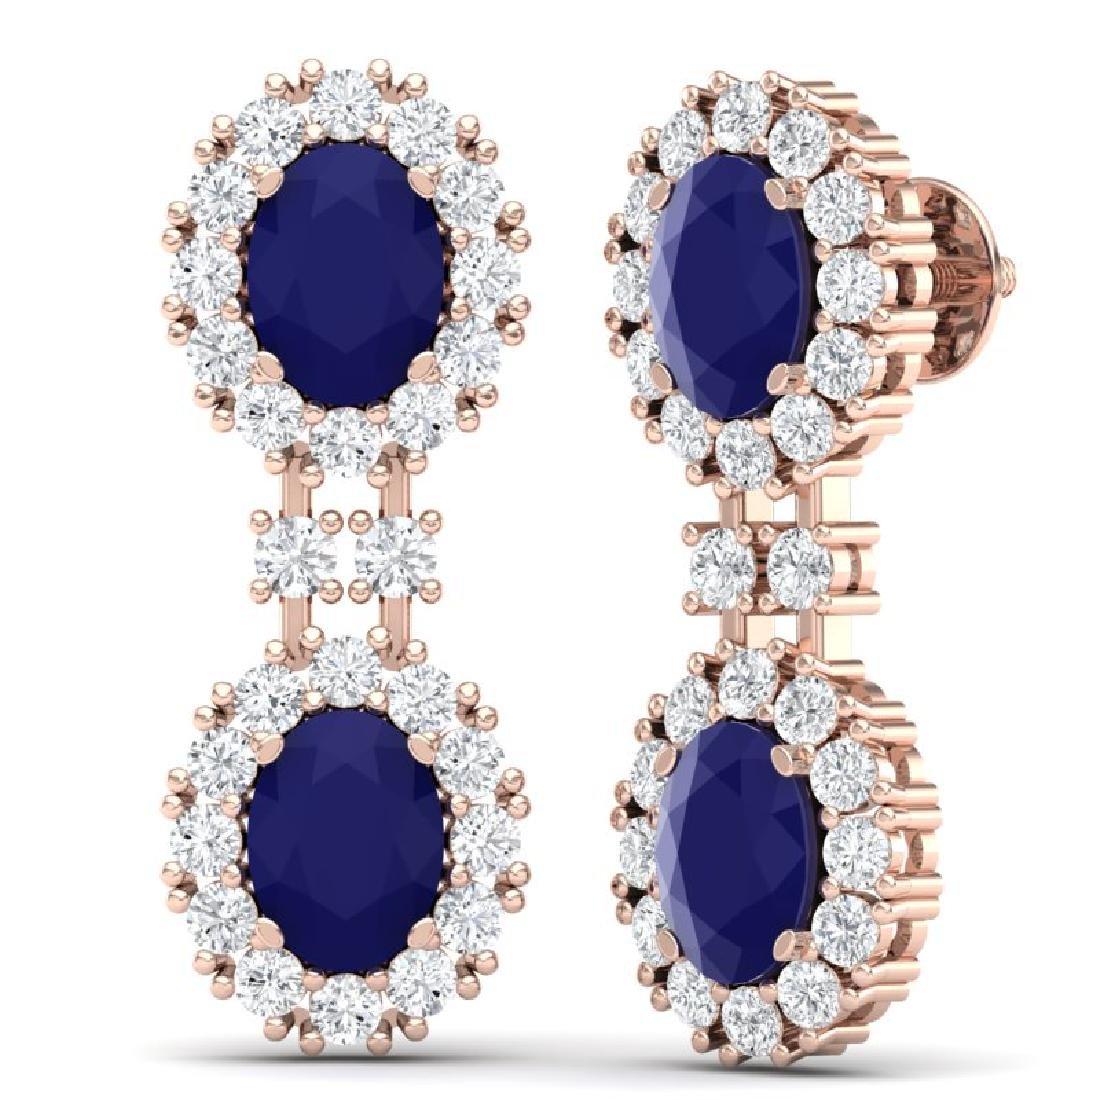 8.98 CTW Royalty Sapphire & VS Diamond Earrings 18K - 3